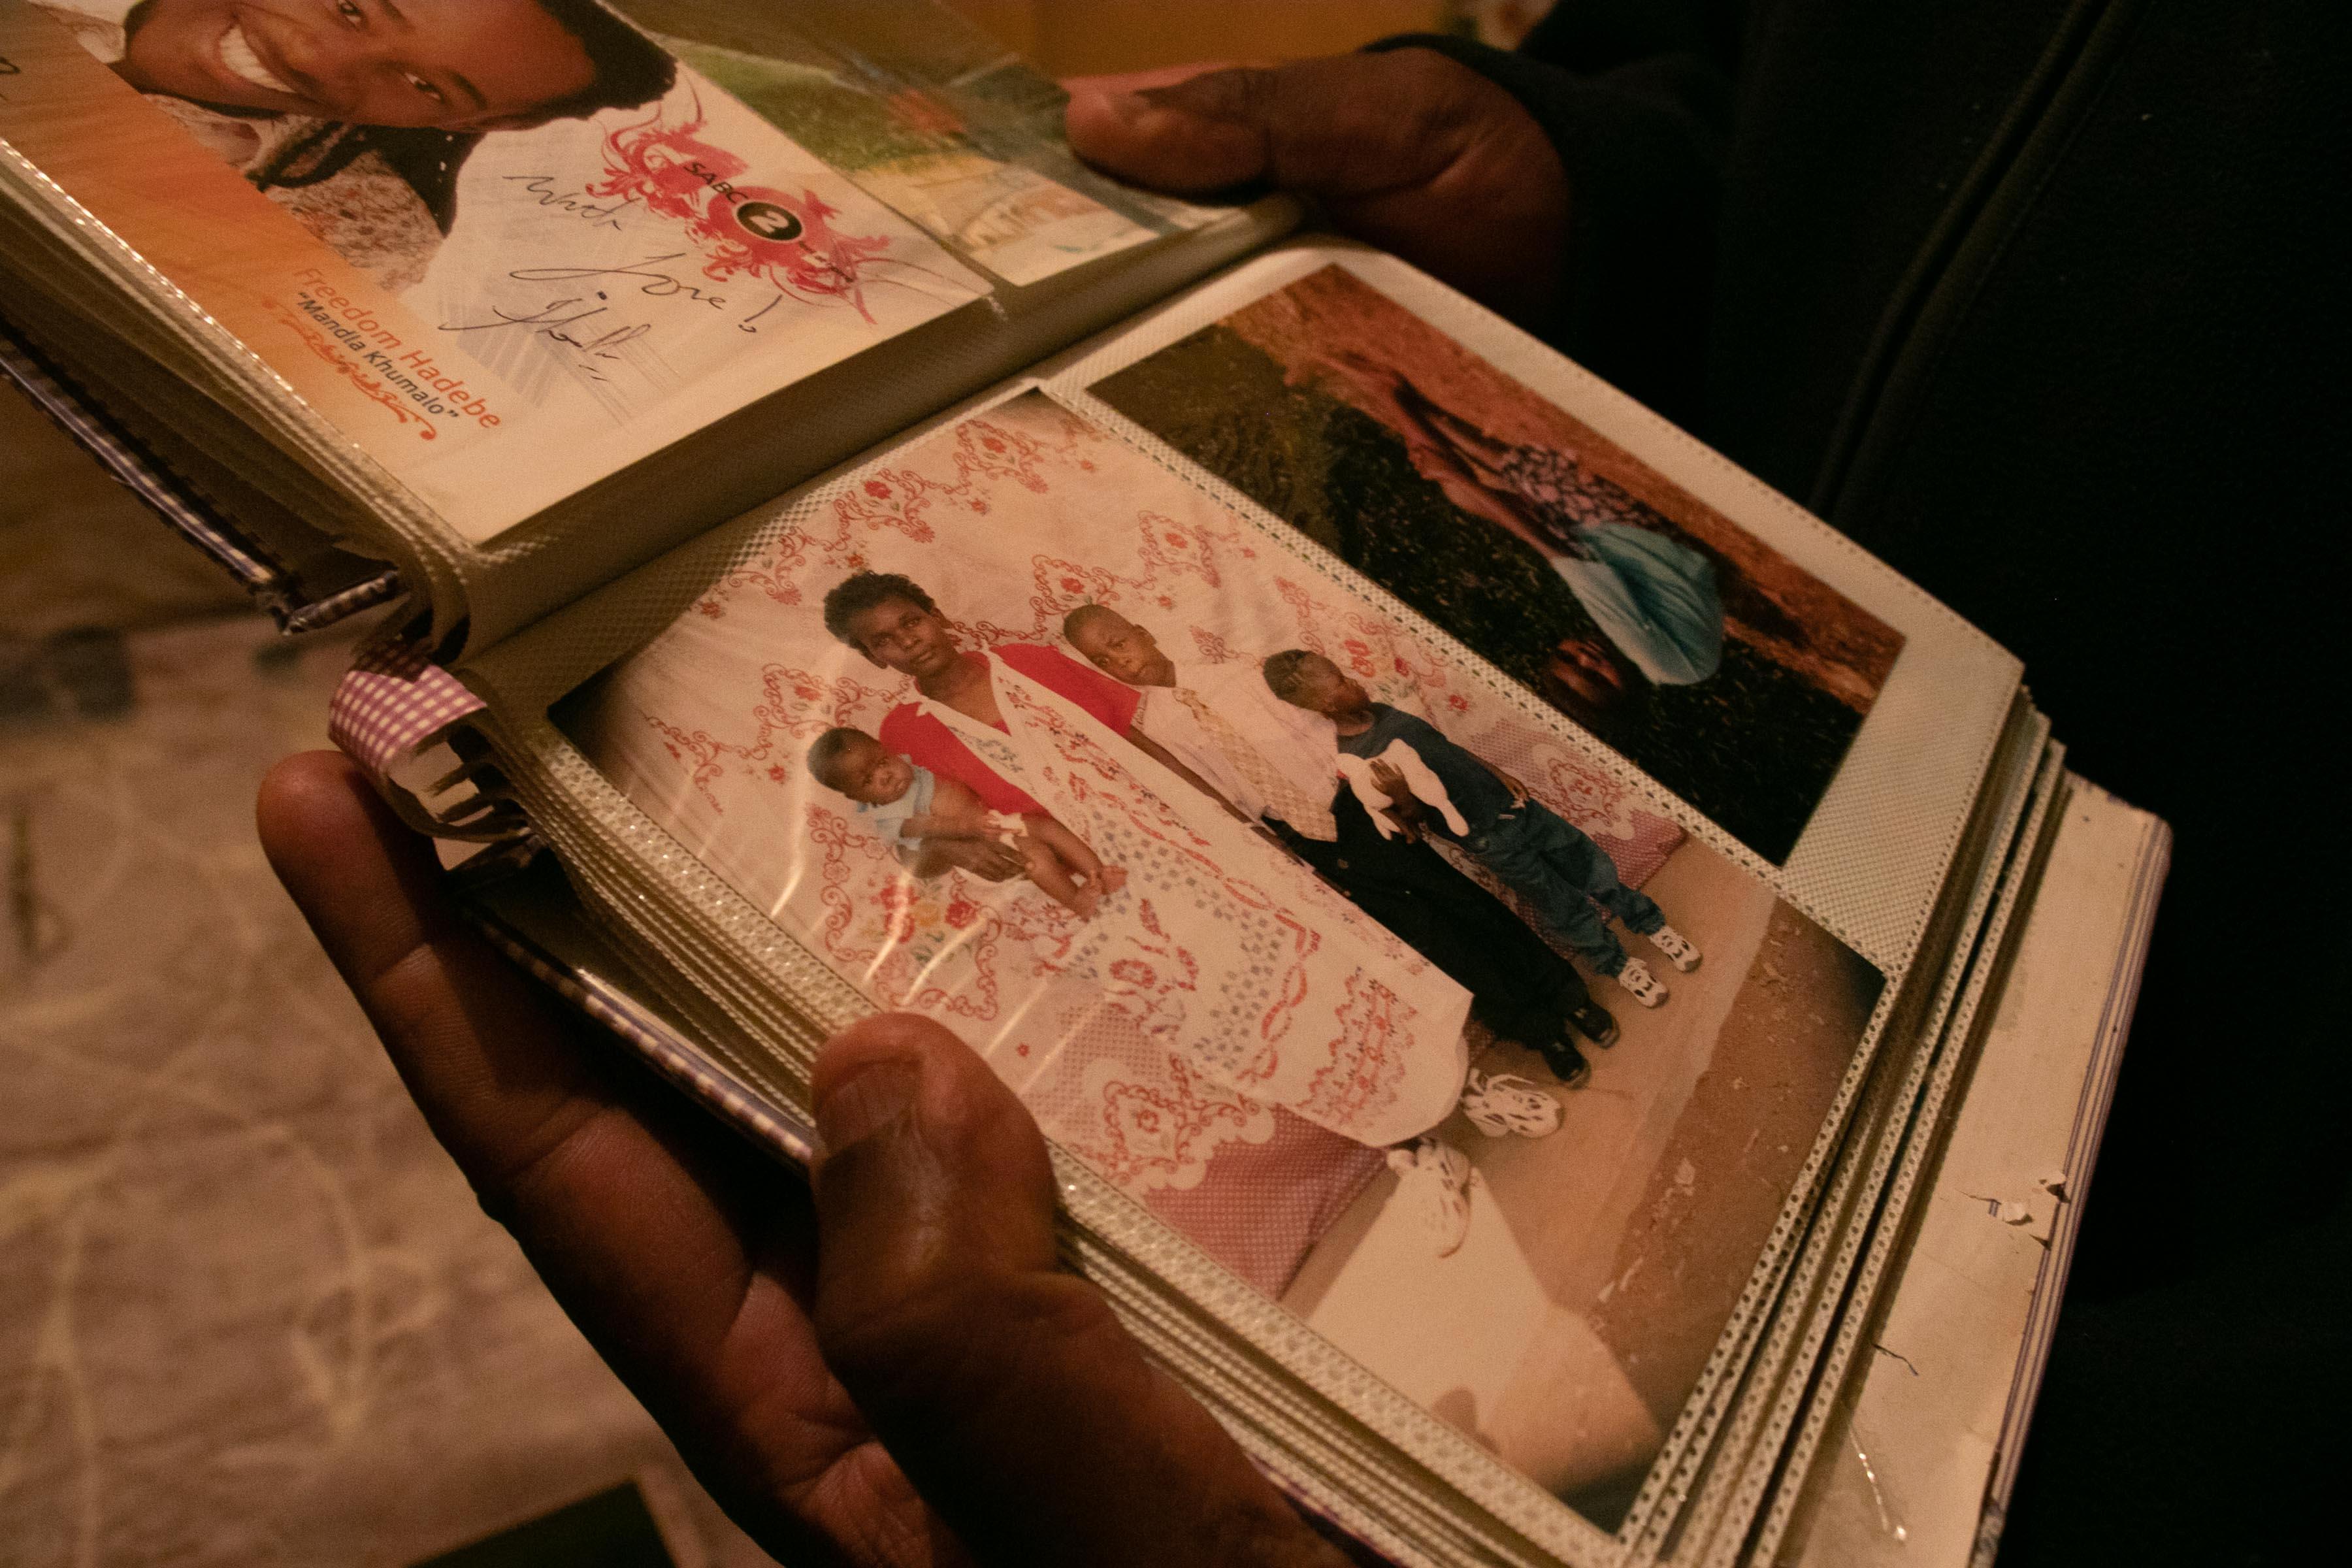 2 October 2019: Edmond Patrick Ndlovu's album of family photos.